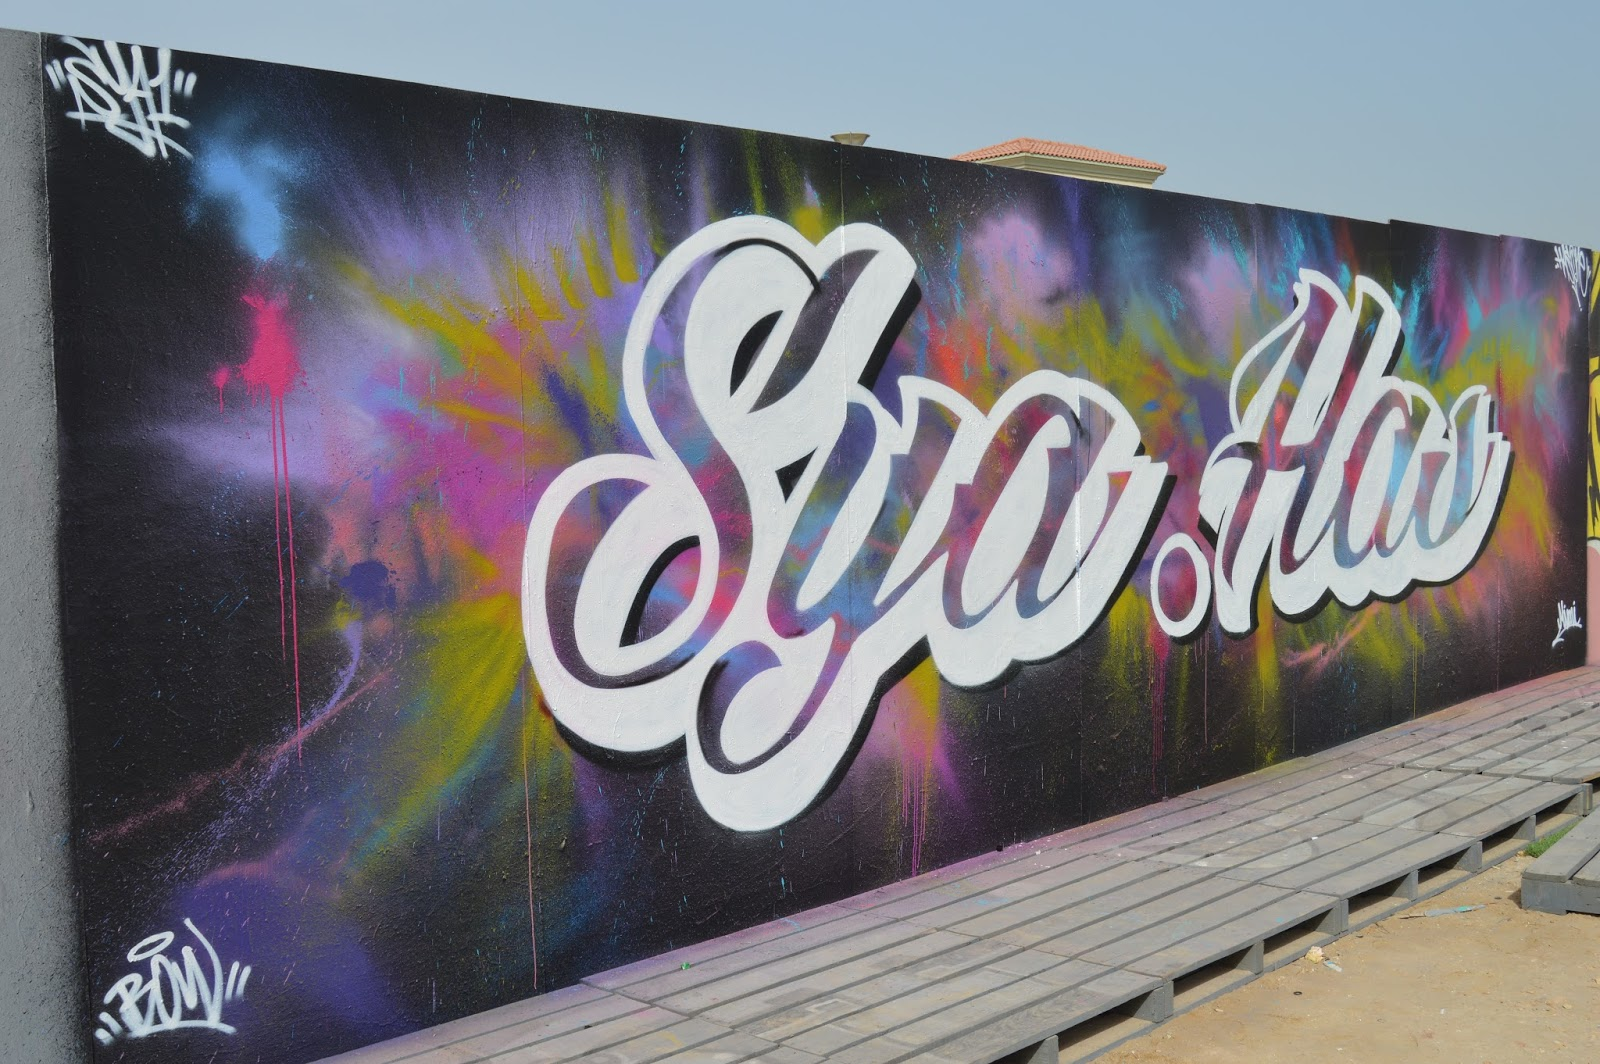 Graffiti wall uae - Posted By Sya One Dubai Graffiti At 11 46 2 Comments